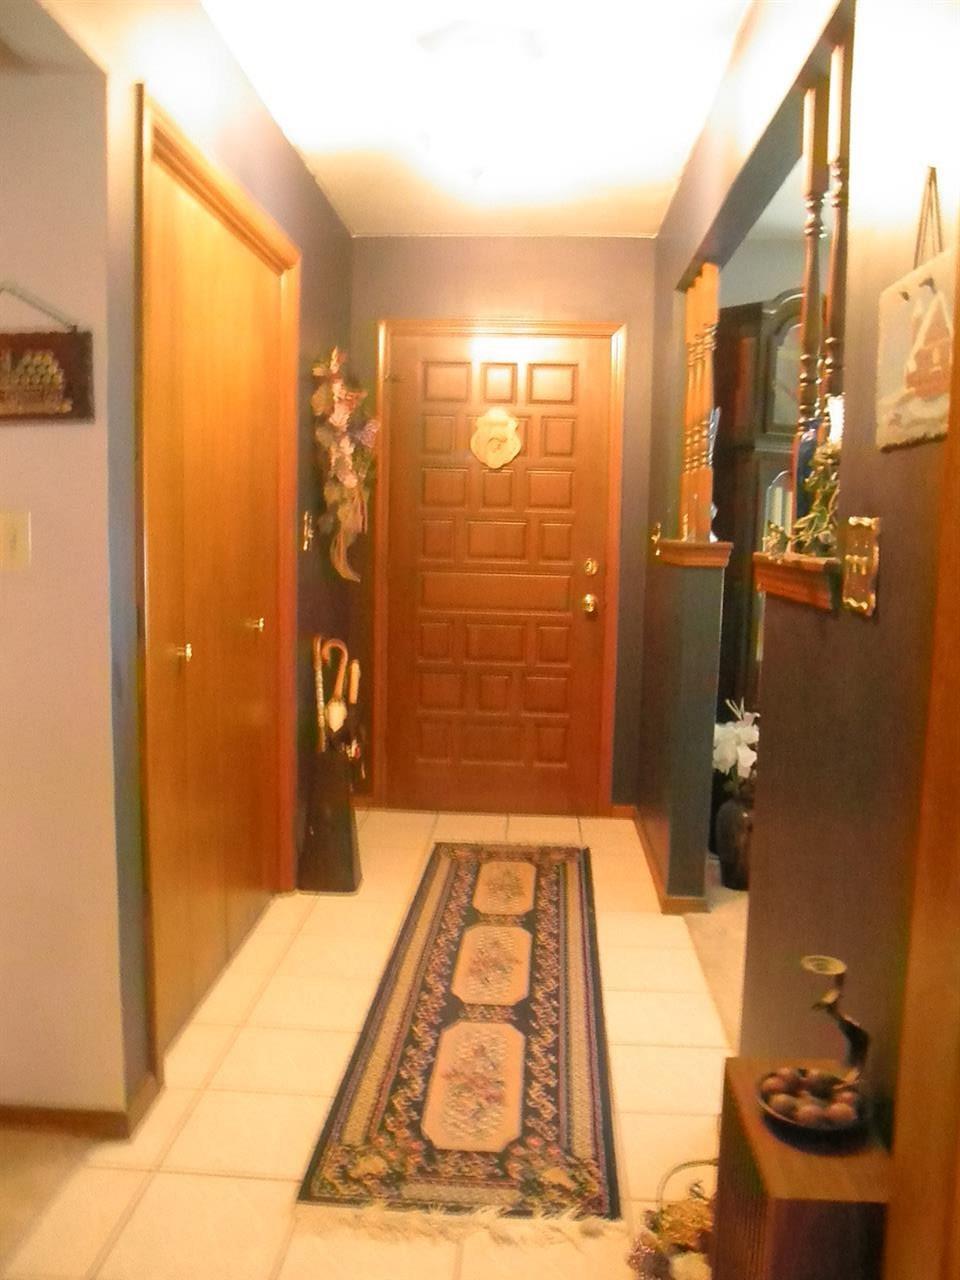 Sold Intraoffice W/MLS | 7 Raintree Ponca City, OK 74604 8